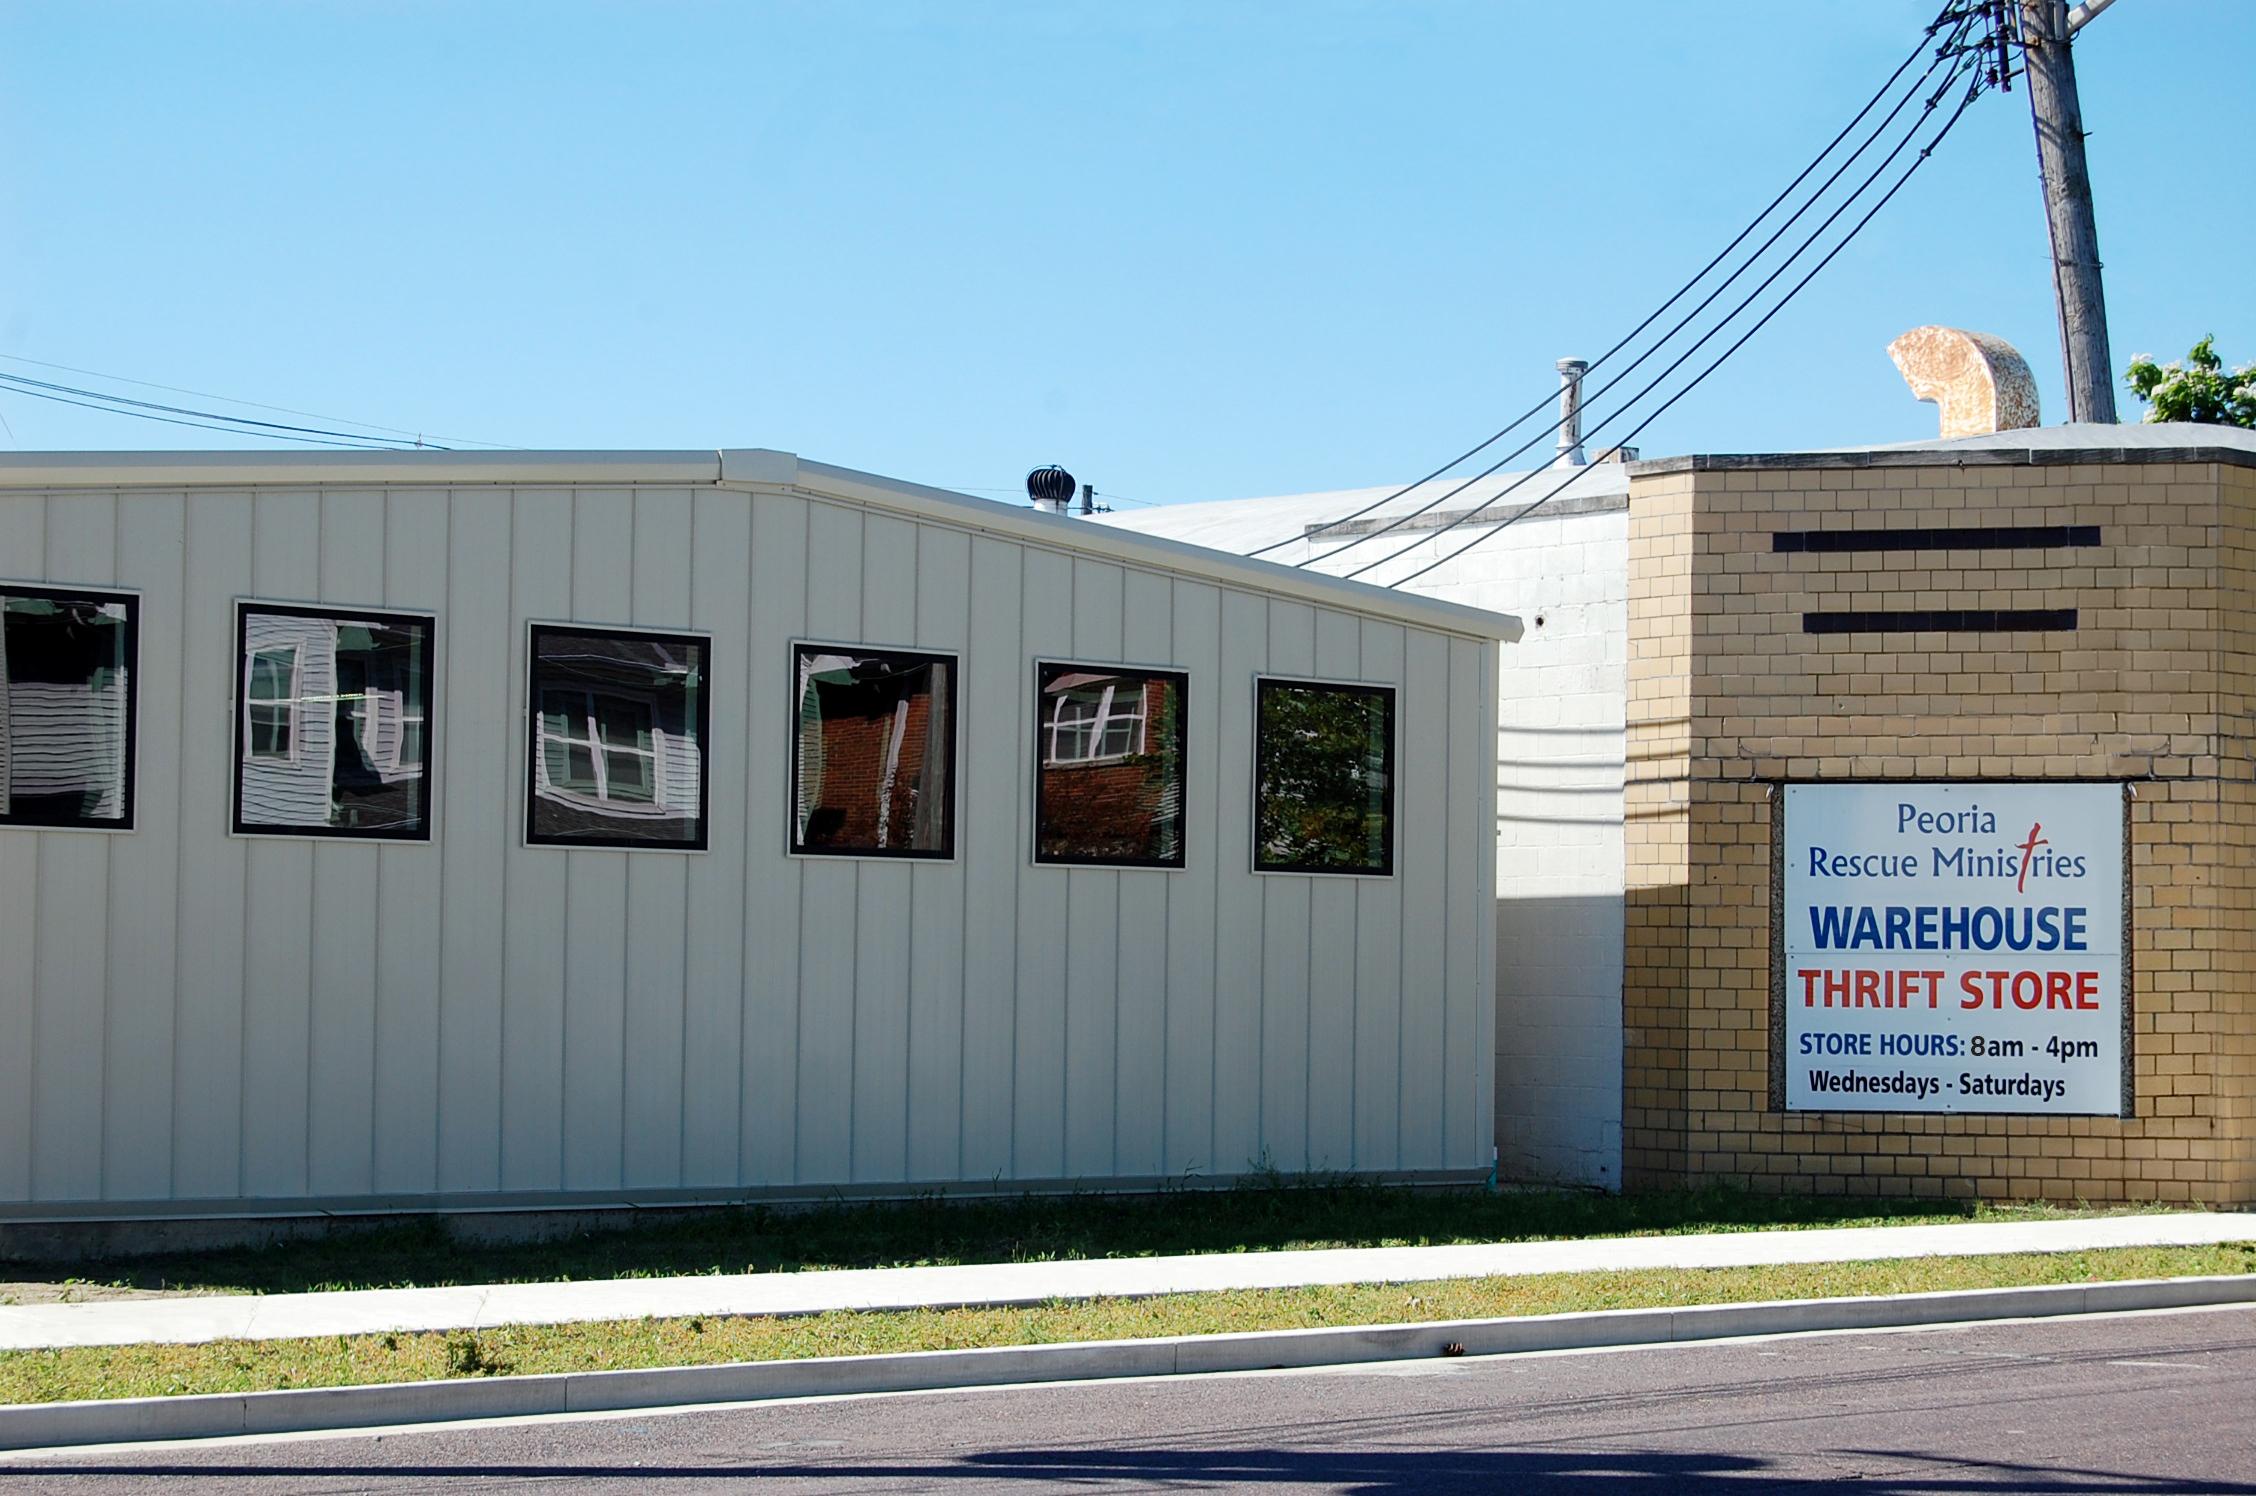 Thrift Store & Donation Center - 1114 SW Jefferson, Peoria IL 61605Phone: (309) 673-3688